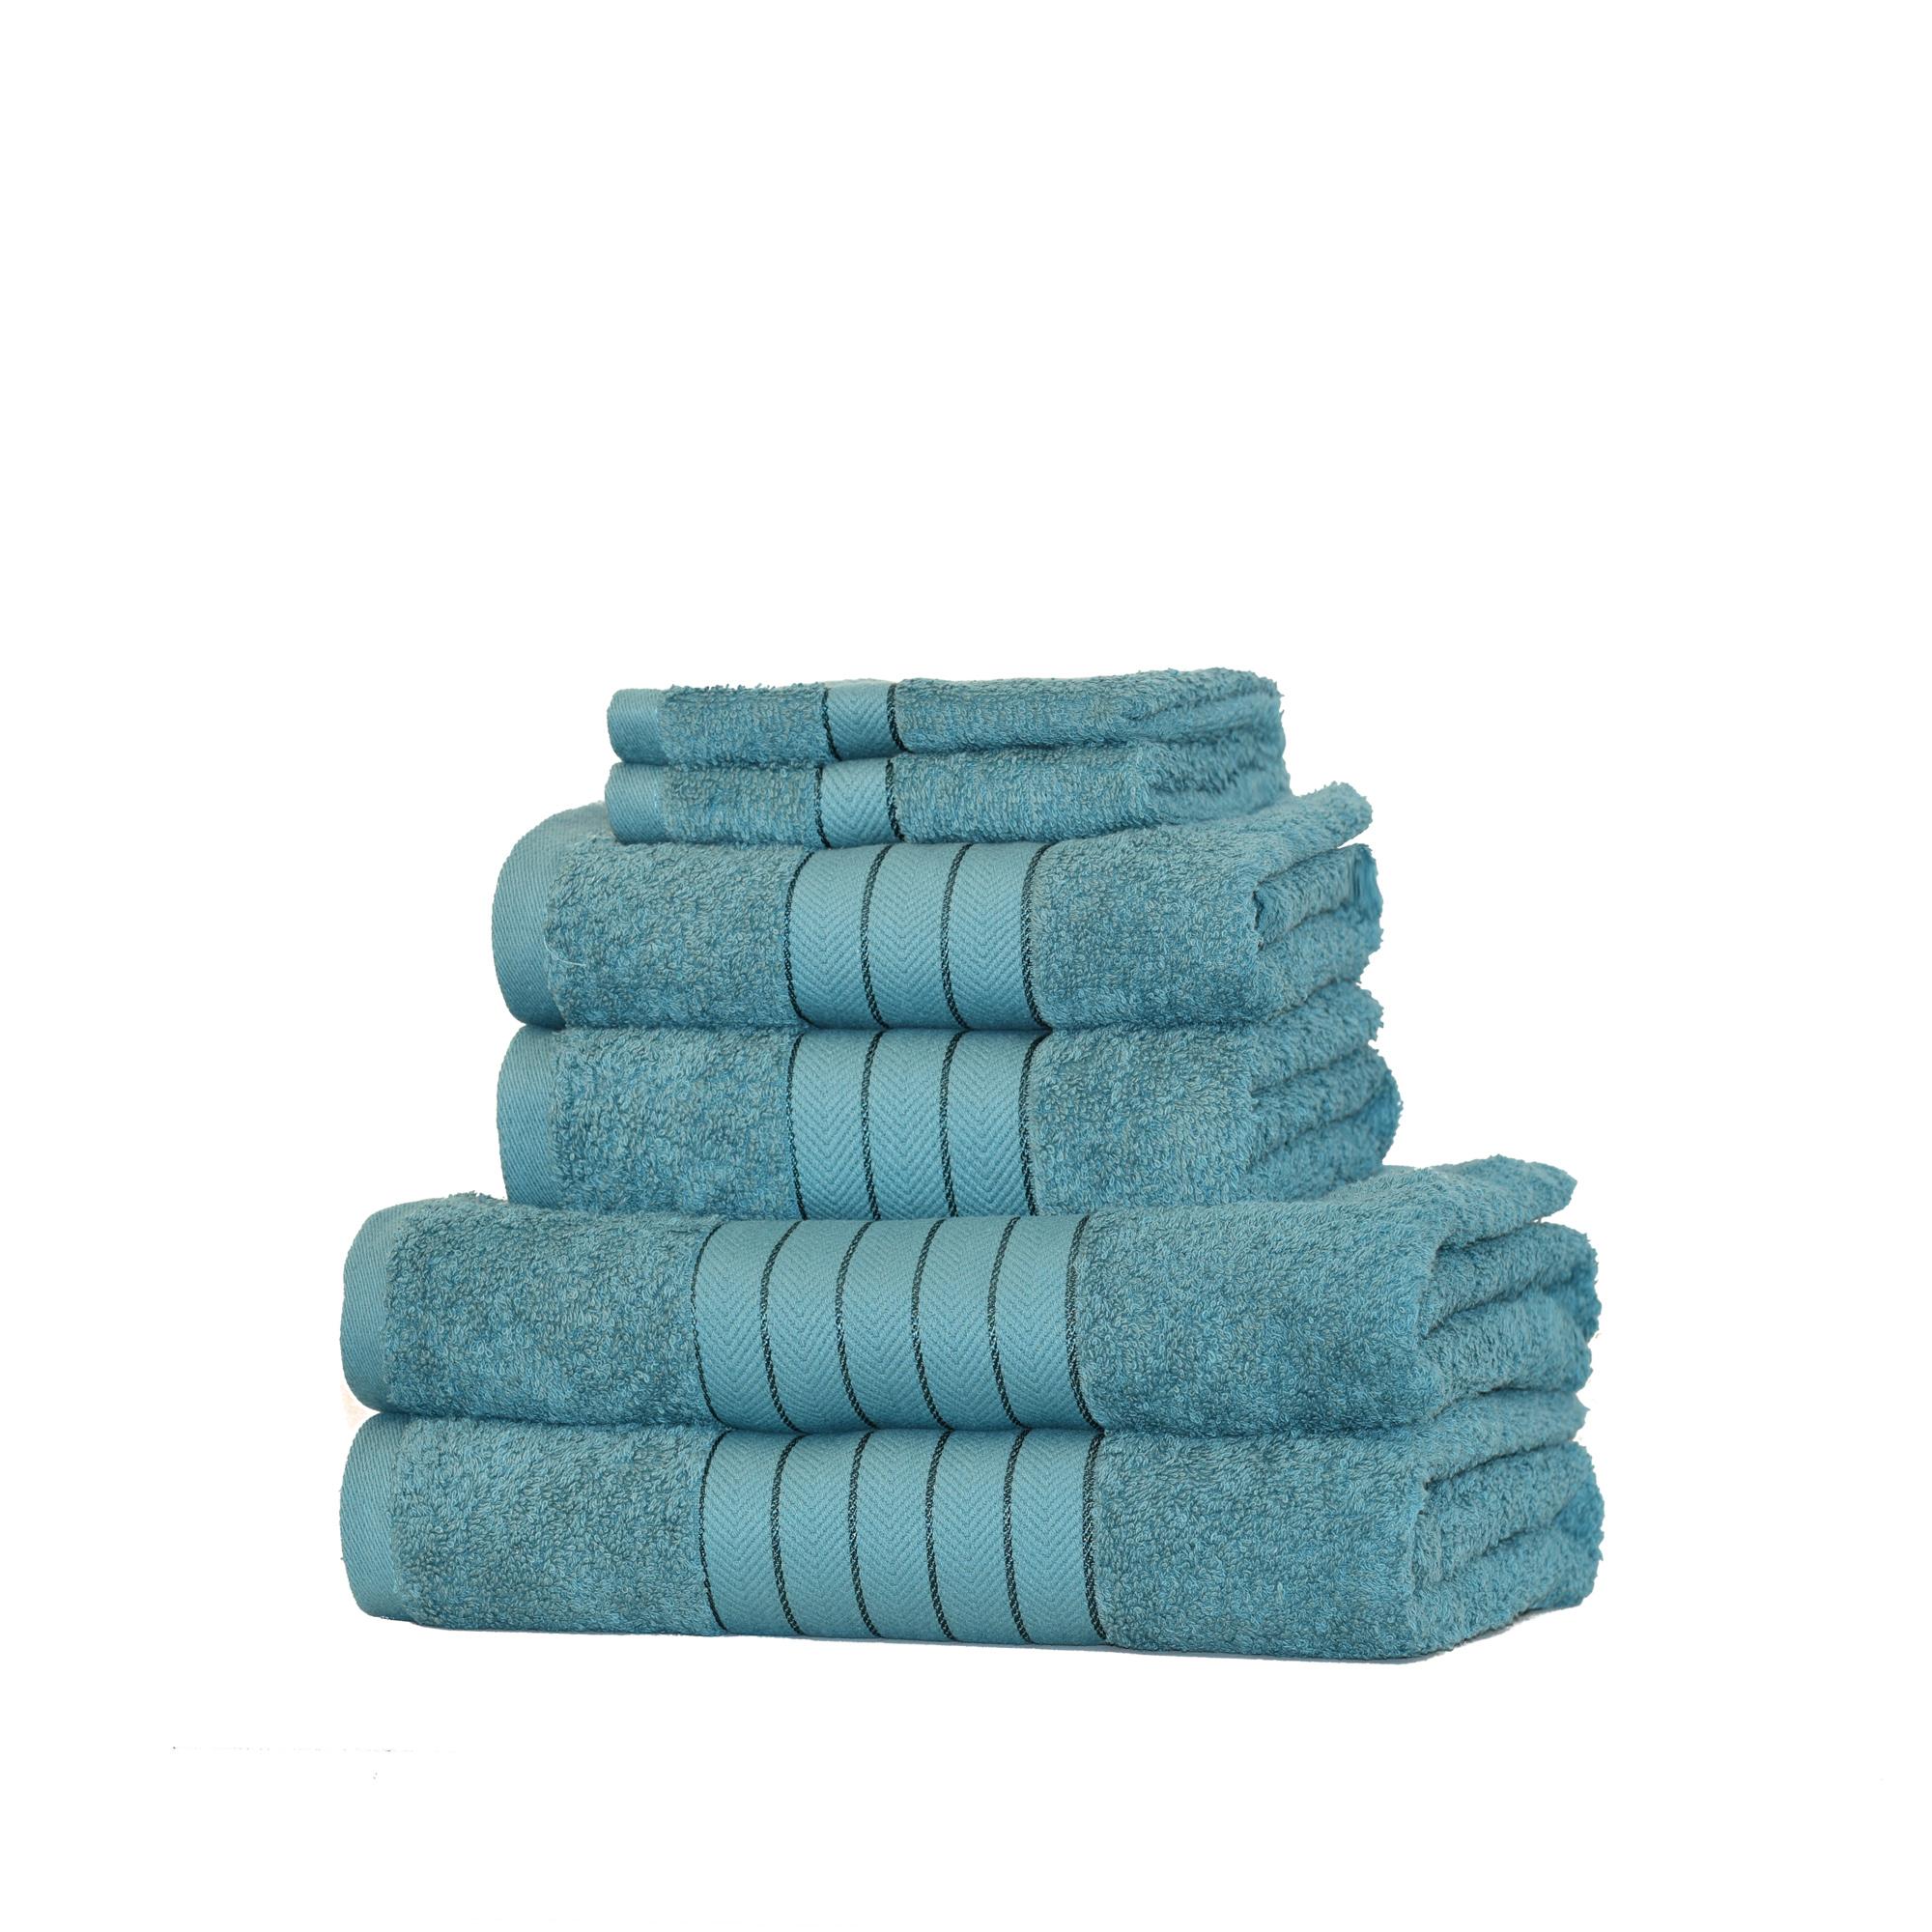 Dreamscene-Luxury-100-Cotton-Face-Hand-Bath-6-Piece-Bathroom-Towel-Bale-Set-NEW thumbnail 28